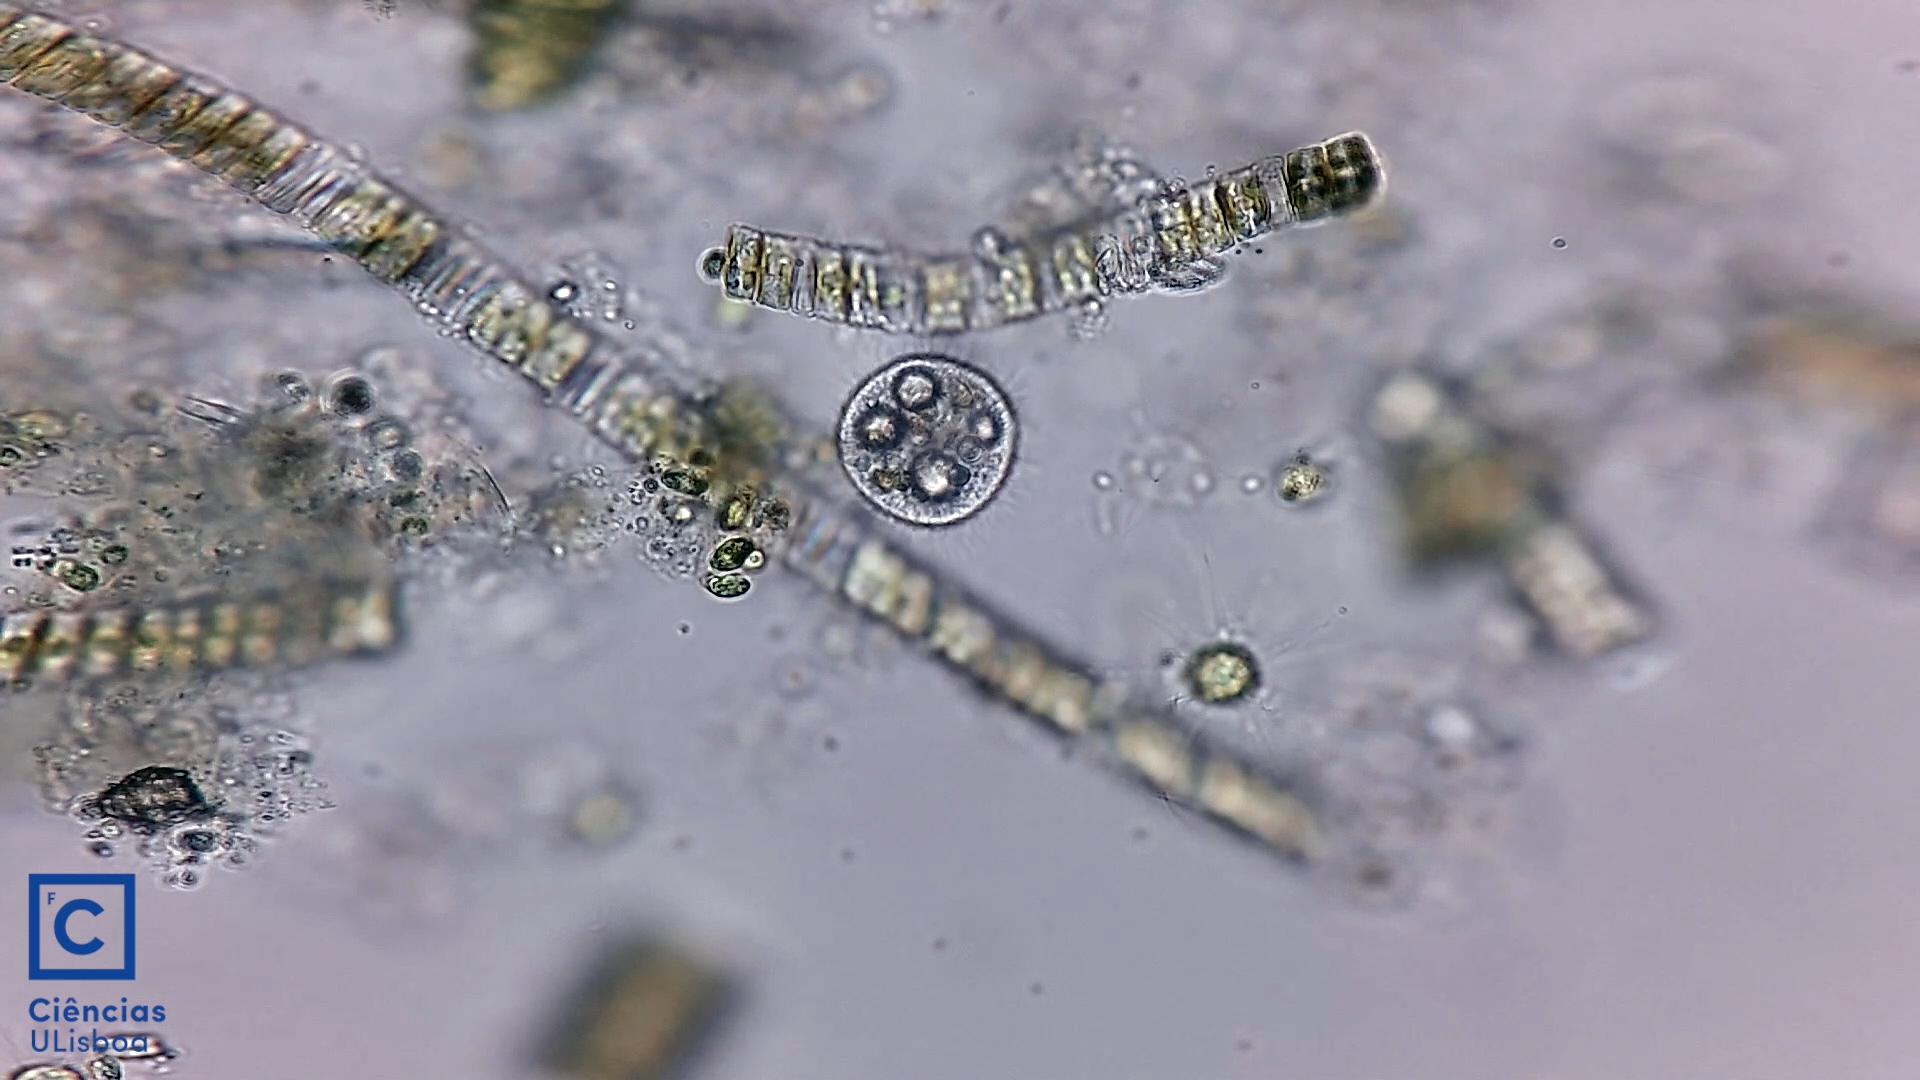 Aquarium water drop 1